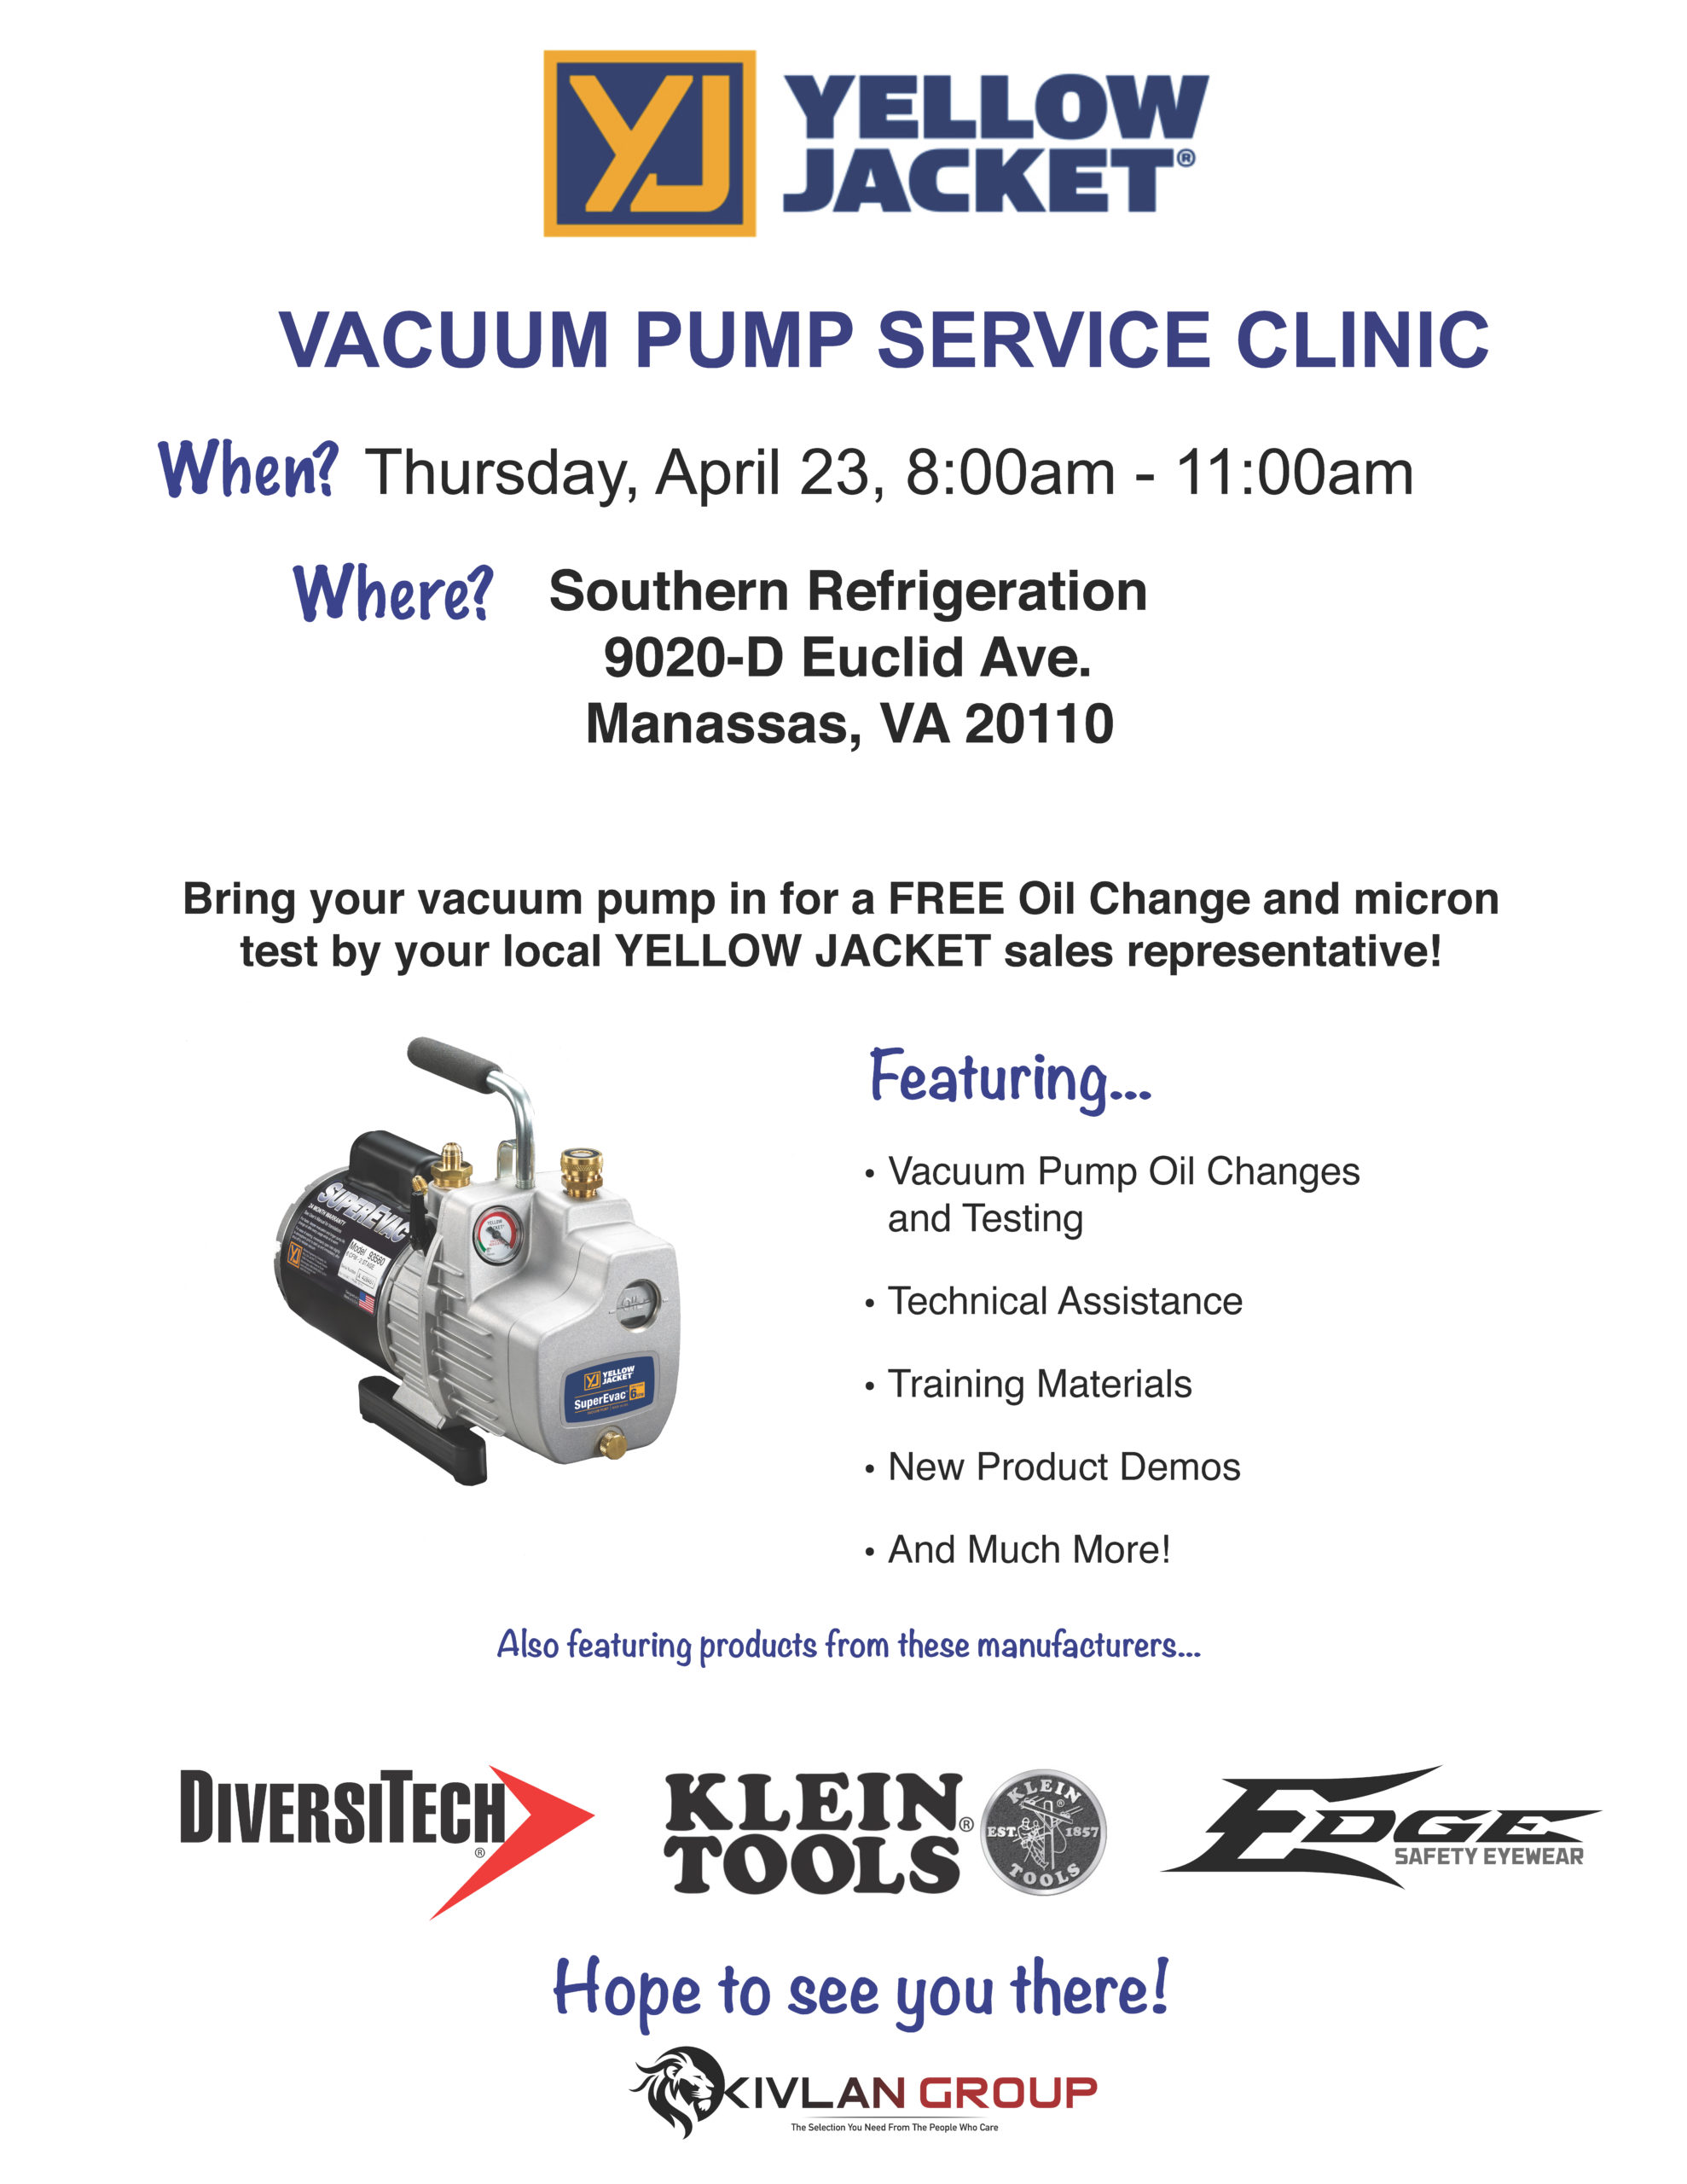 Yellow Jacket Vacuum Pump Service – Manassas @ Southern Refrigeration - Manassas